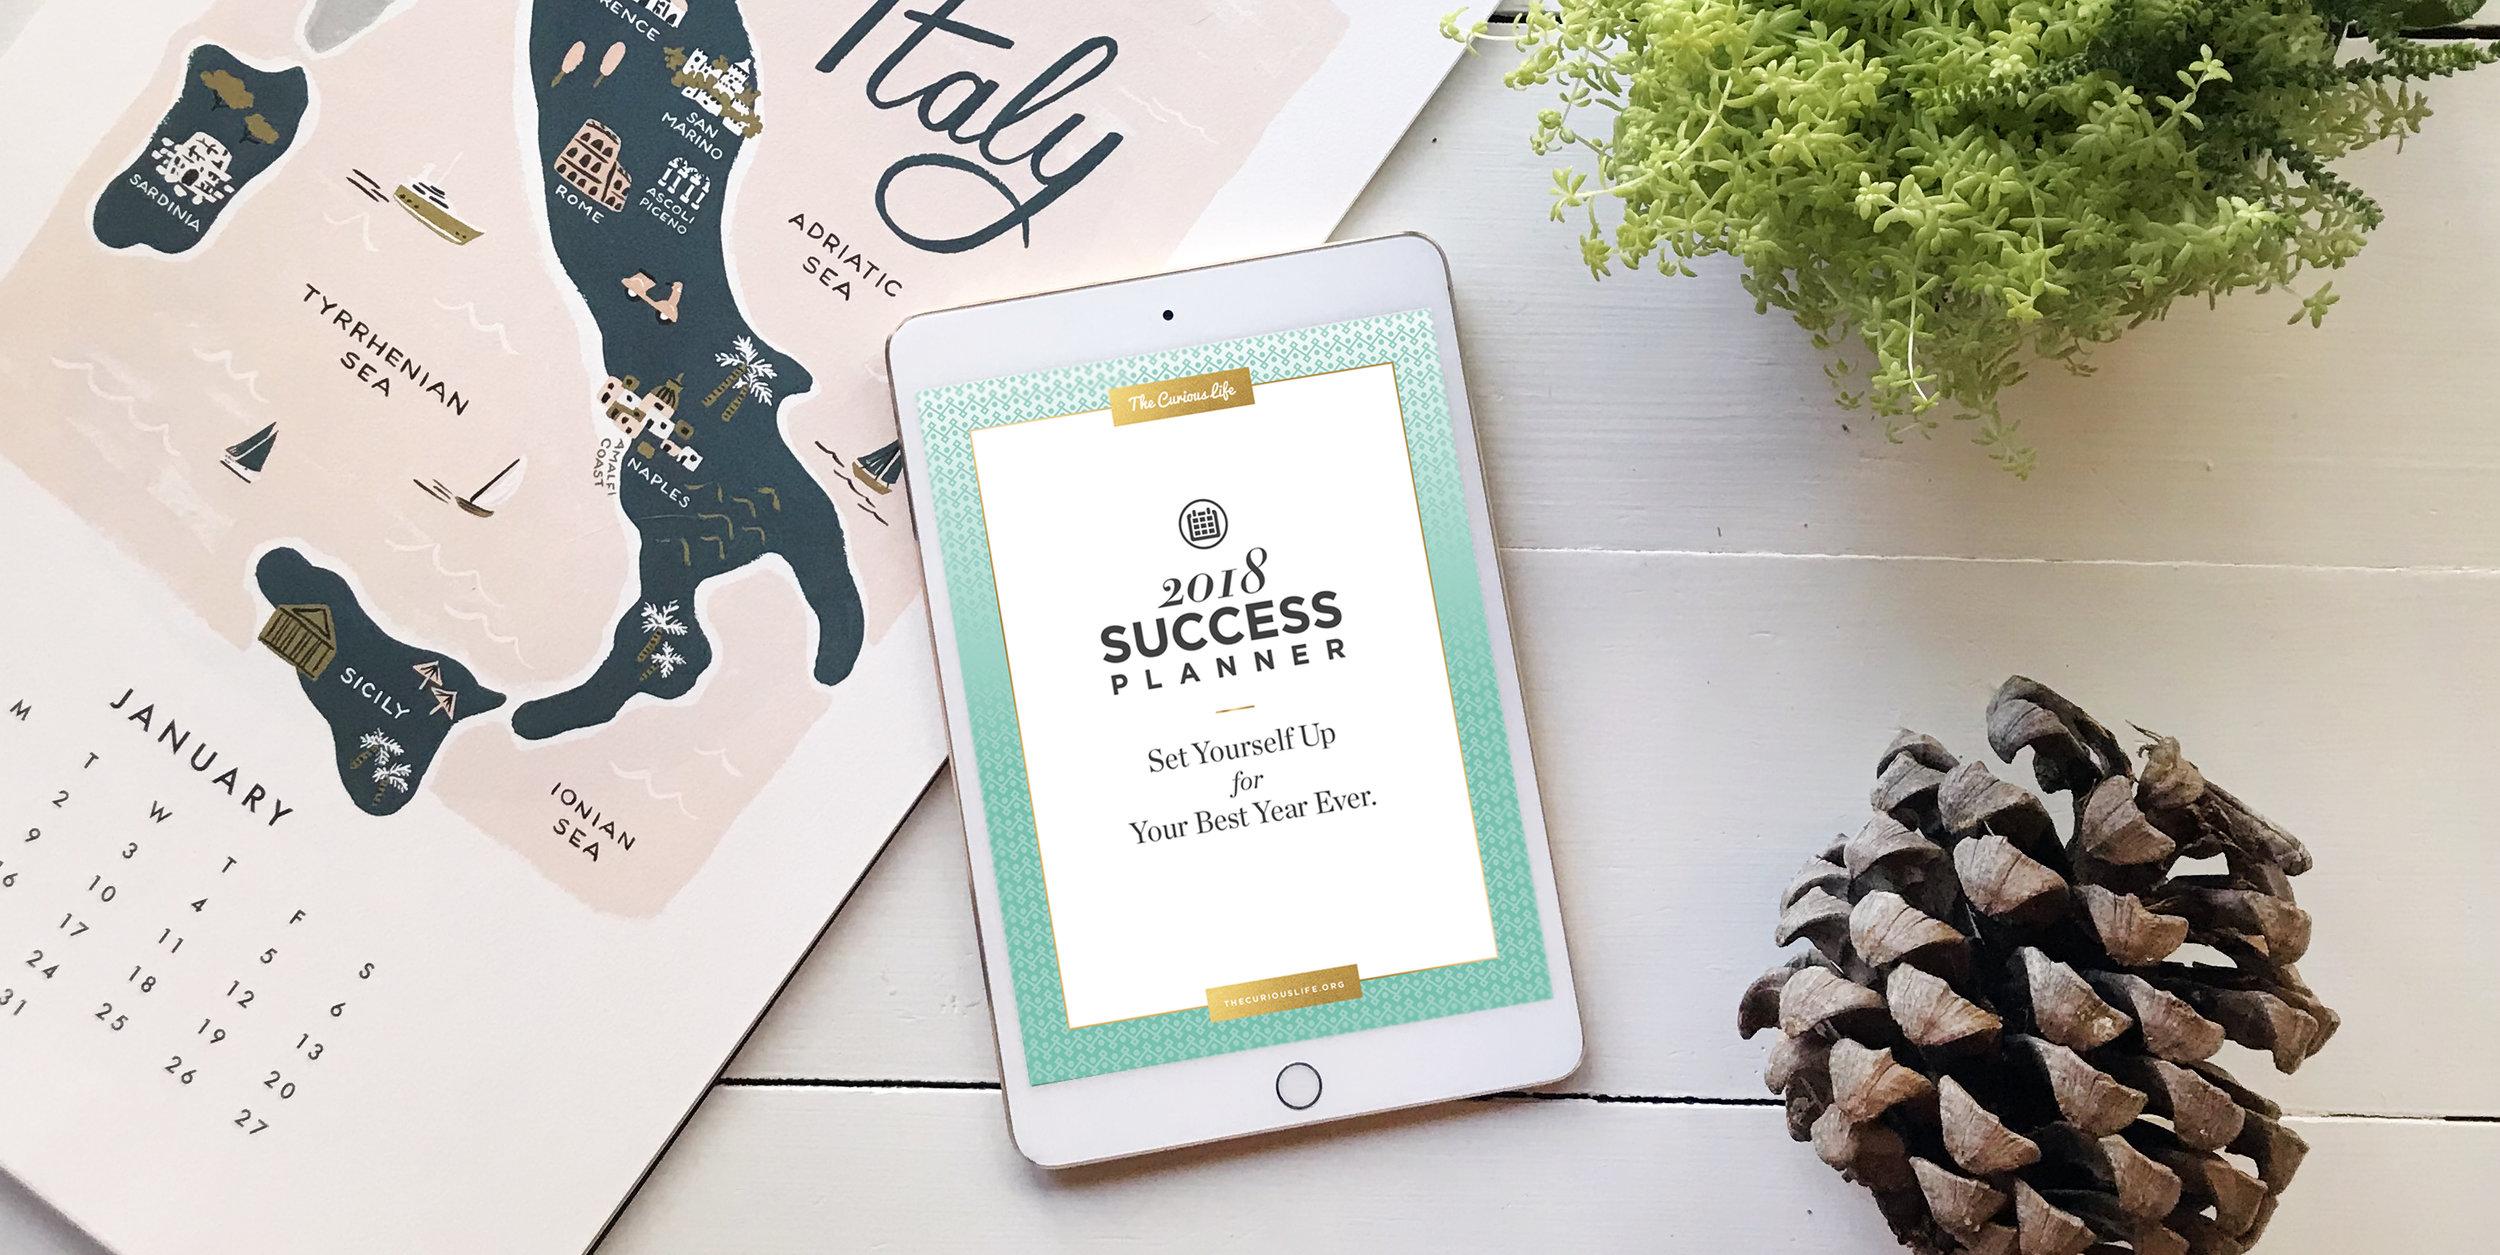 2018 Calendar, 2018 planner, the curious life, success planner